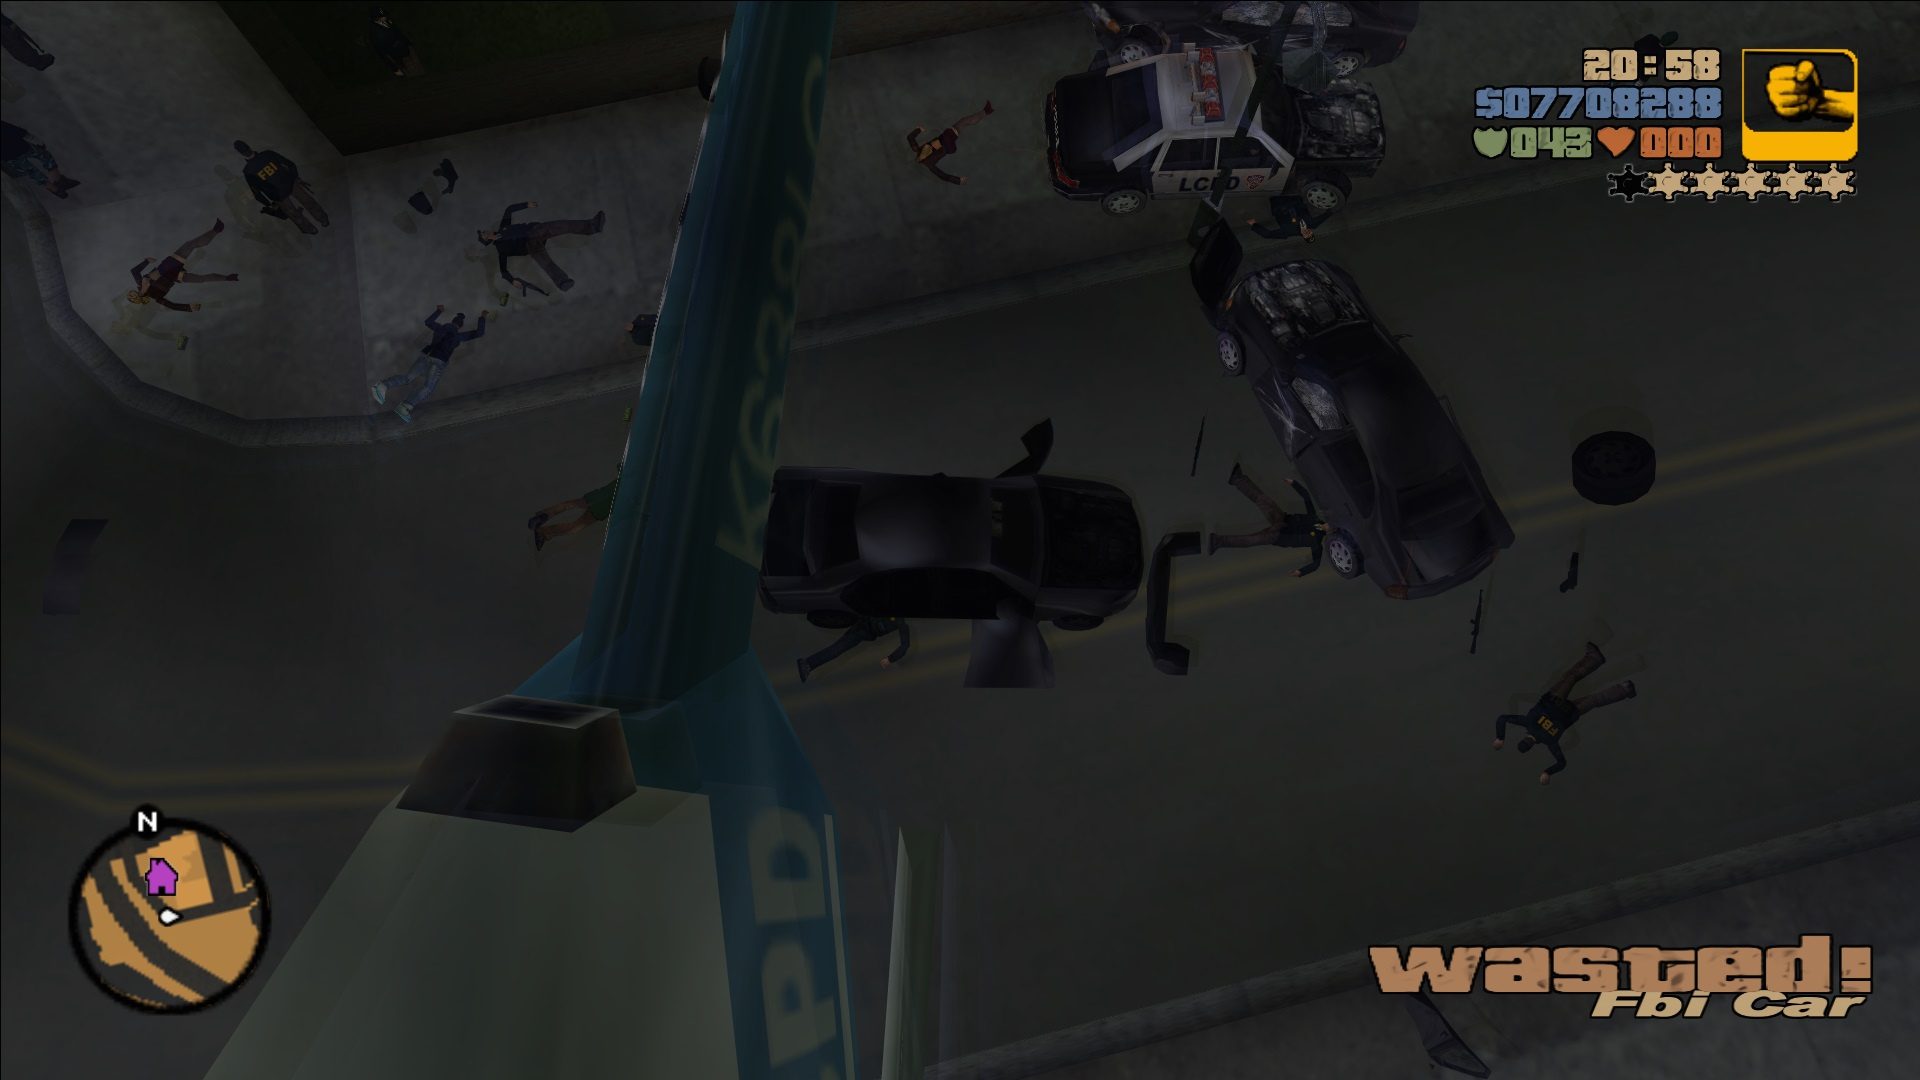 File:Wasted-GTA3.jpg